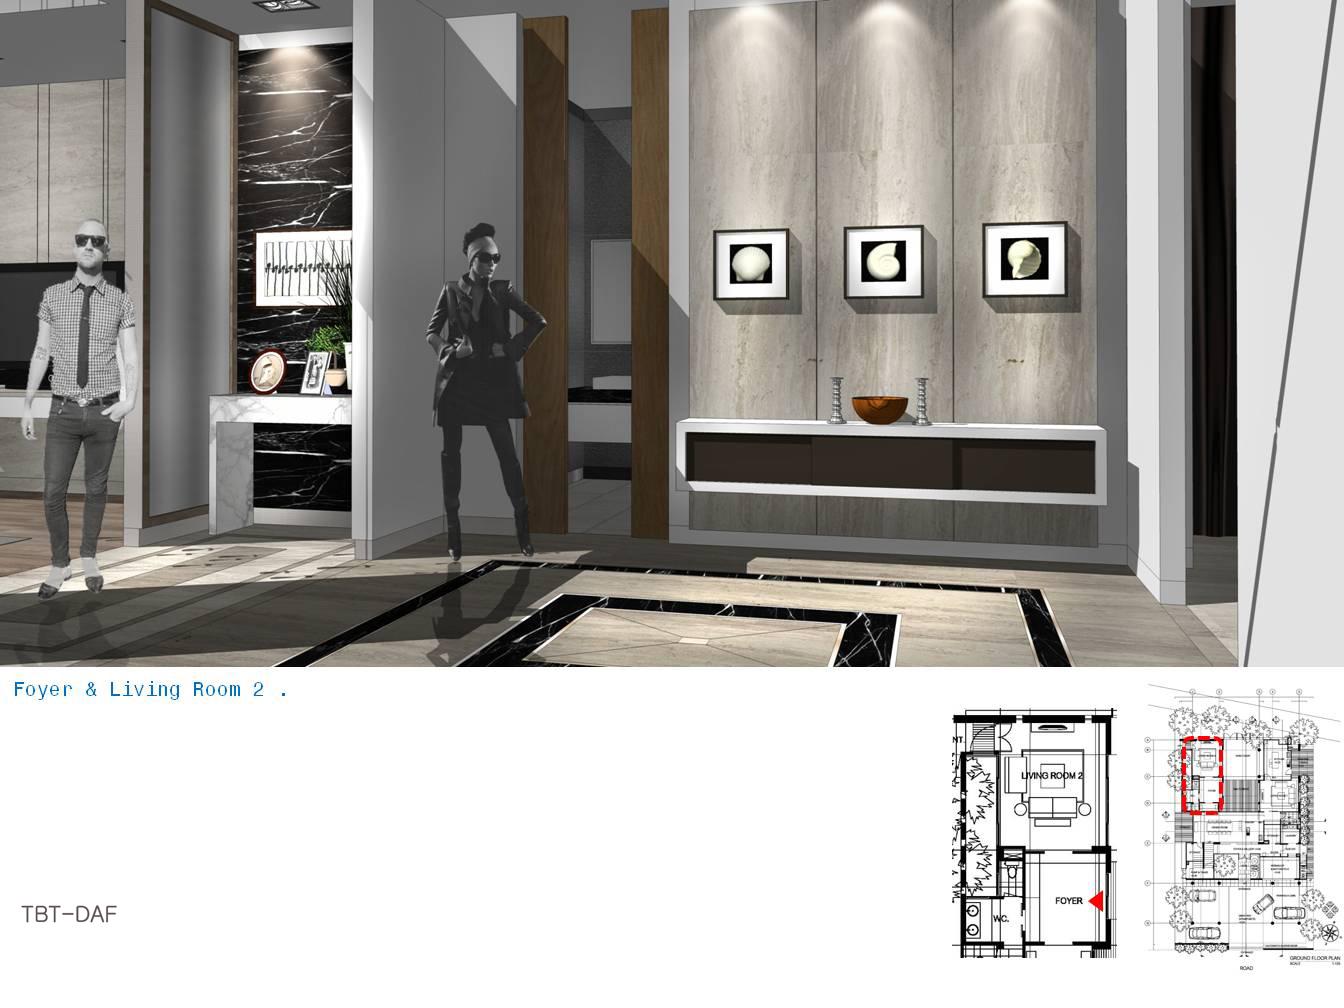 TBT-DAF interior design house robinson 11